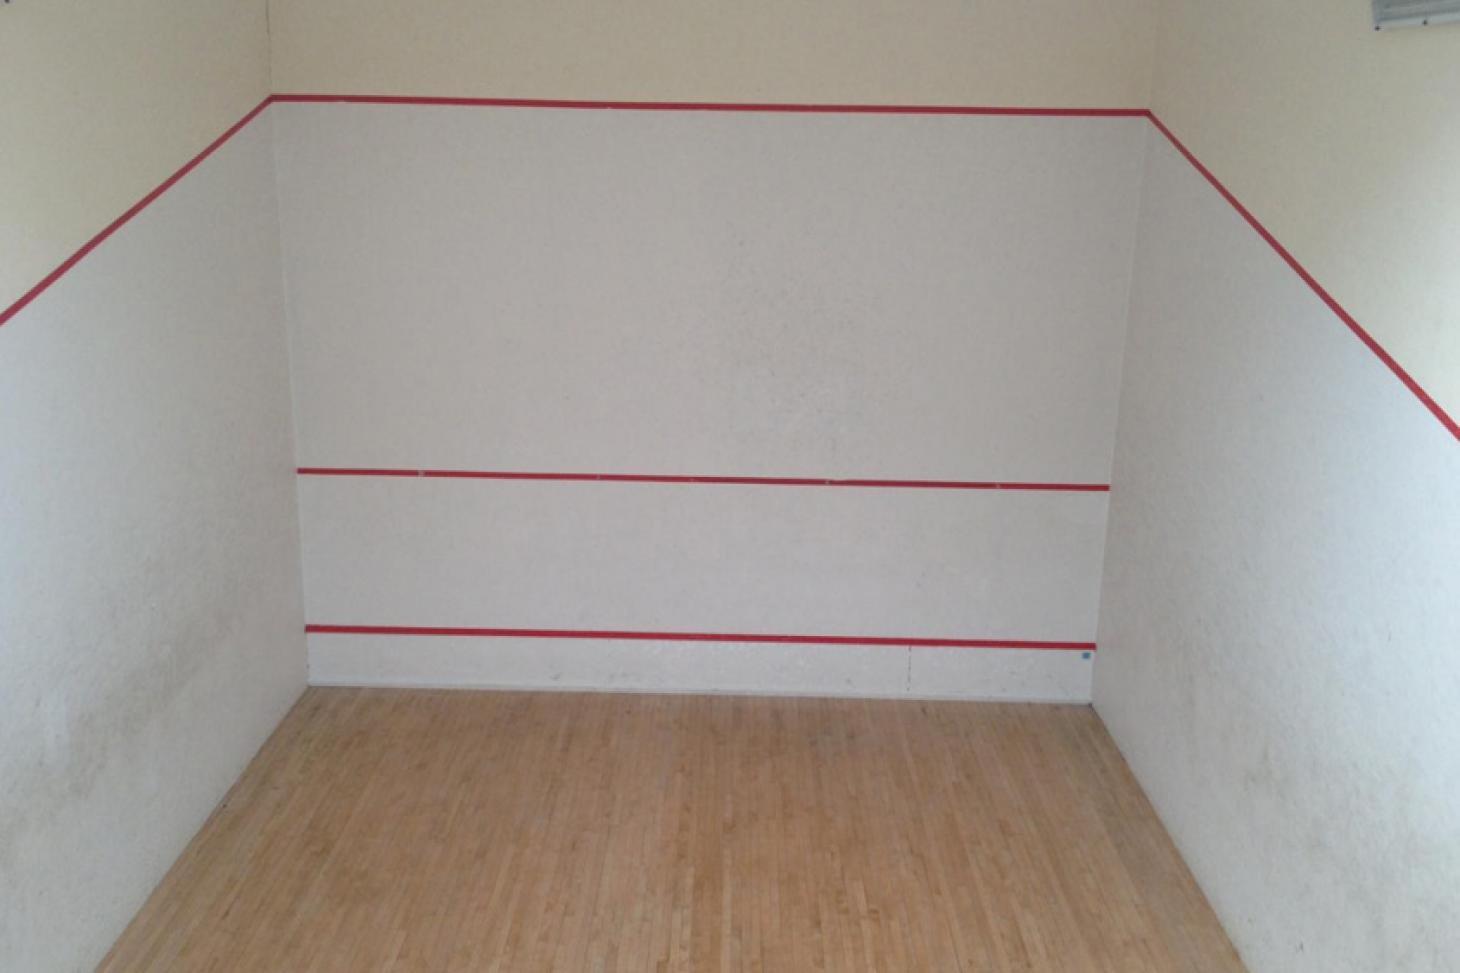 Robert Lowe Sports Centre Indoor   Hard squash court